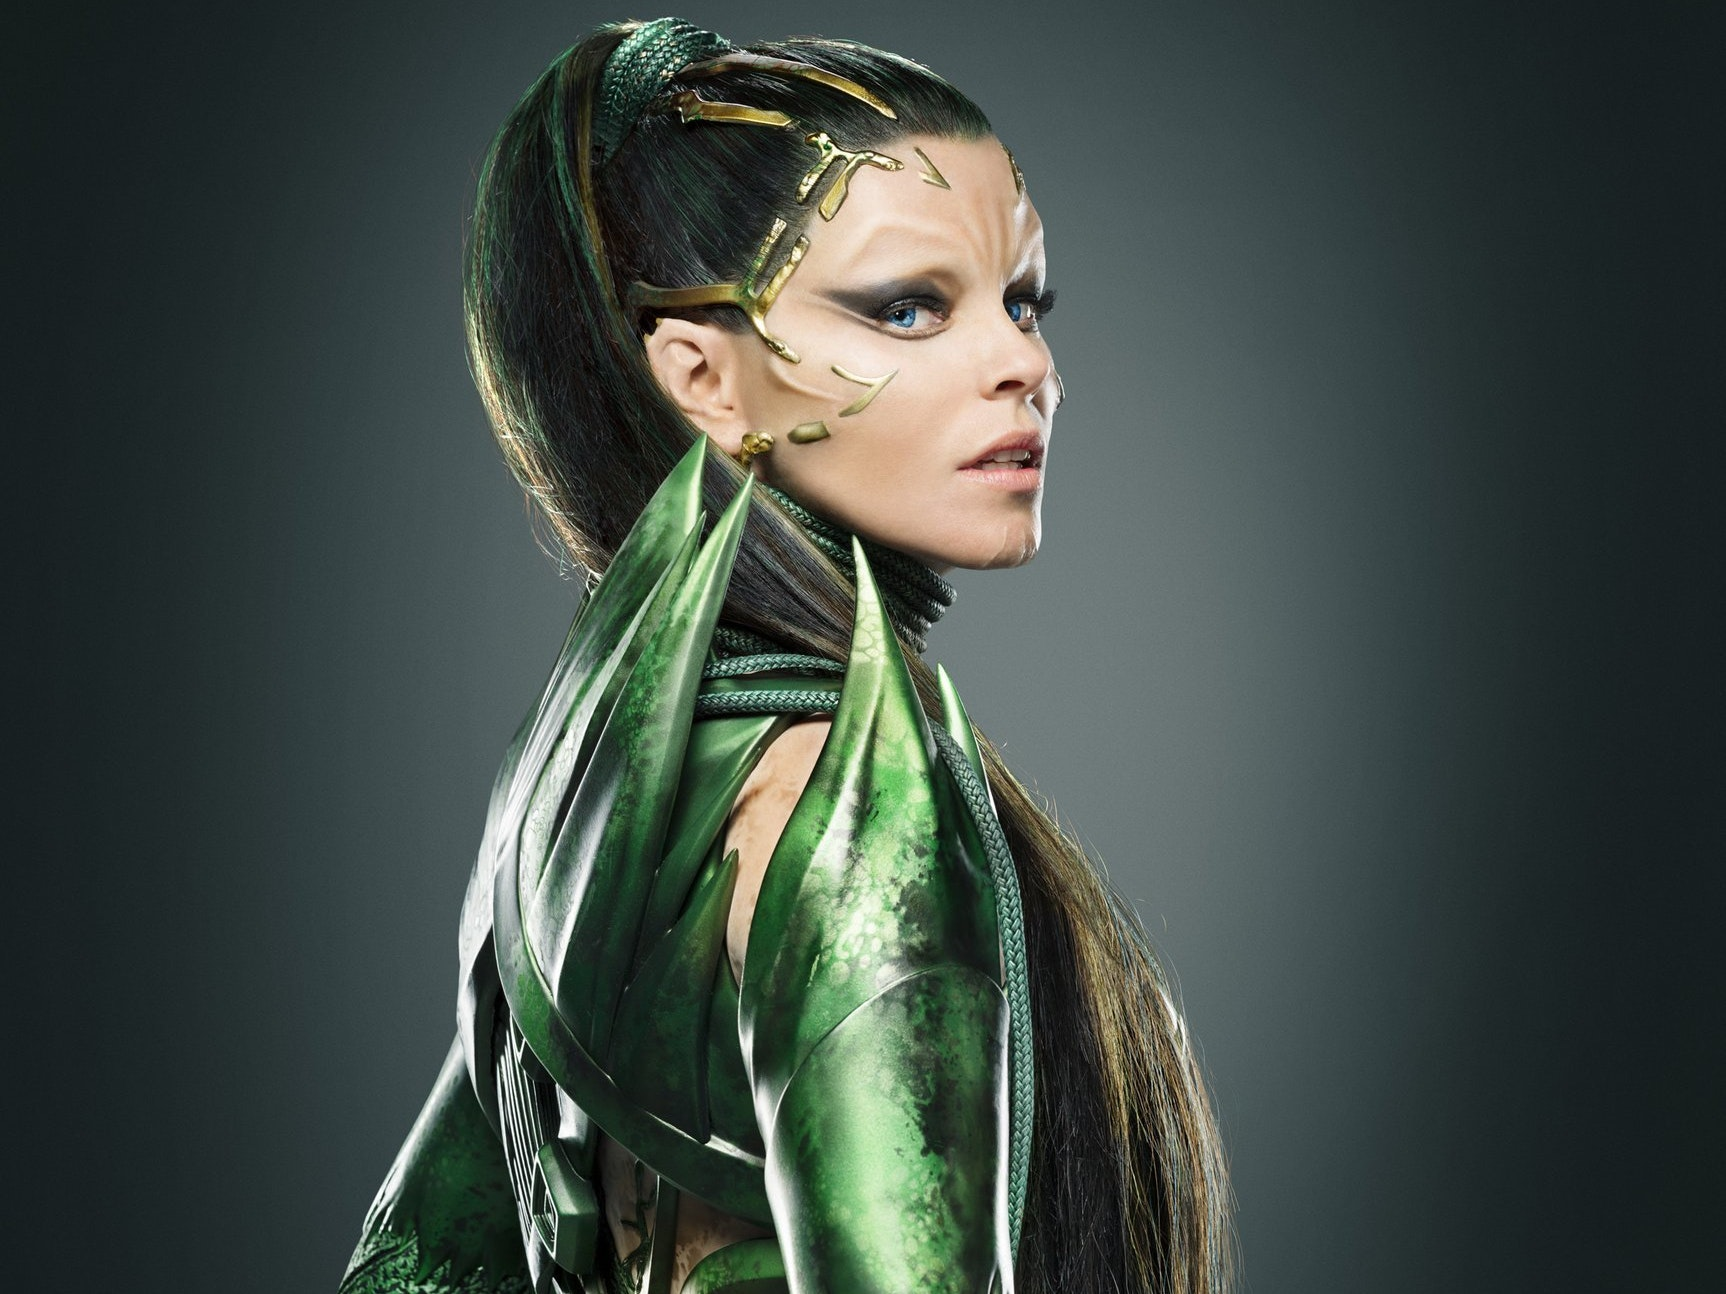 Did Rita Repulsa Kill the Green Ranger in 'Power Rangers'?